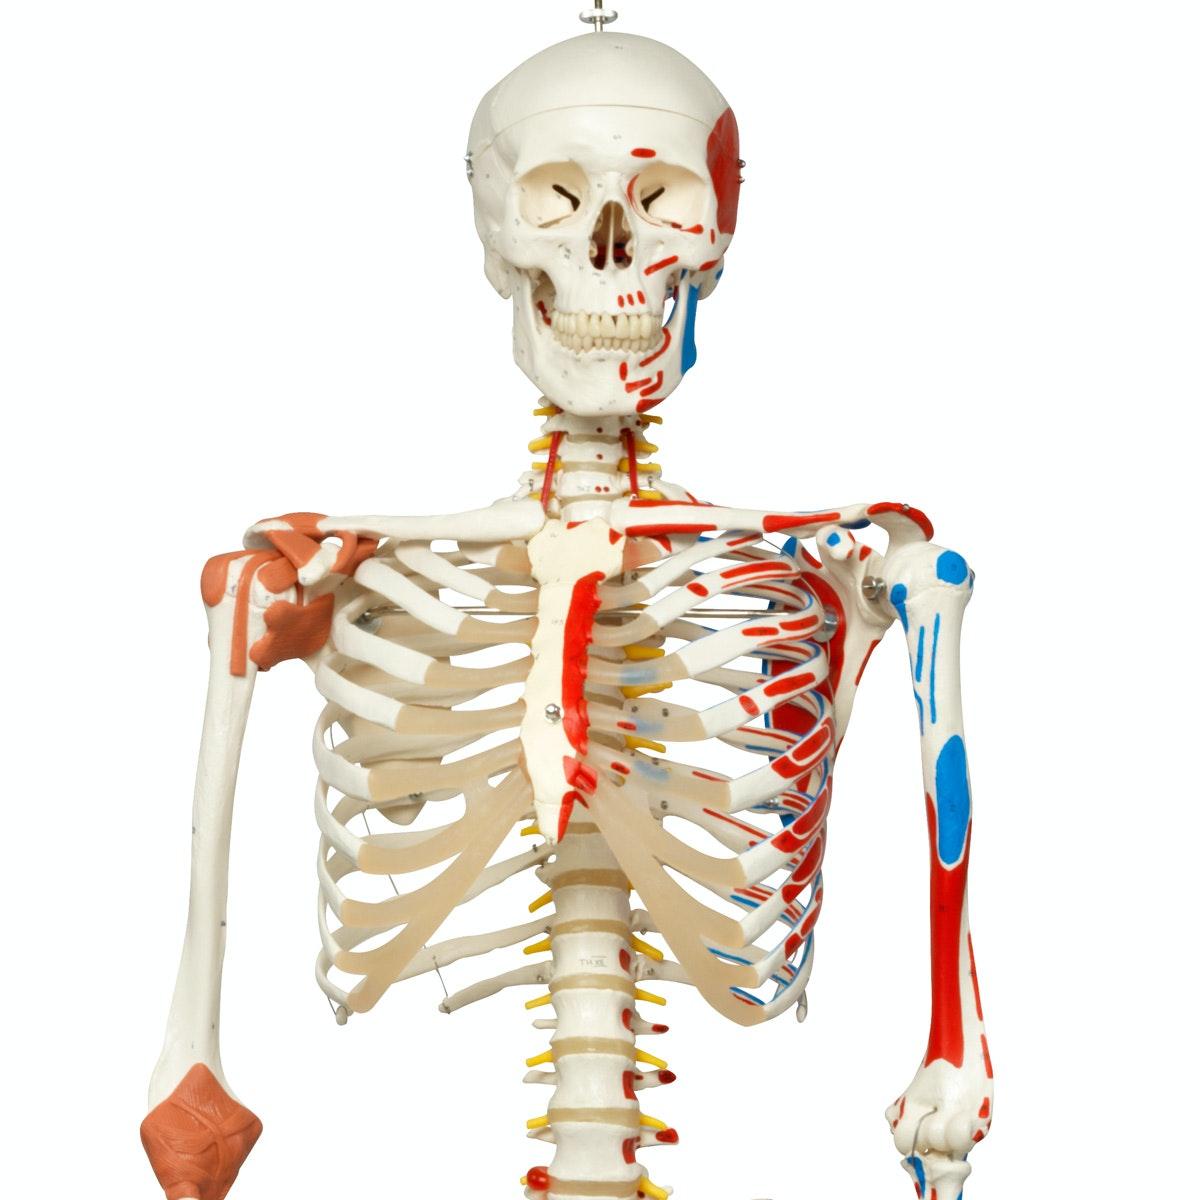 Hele skeletmodeller